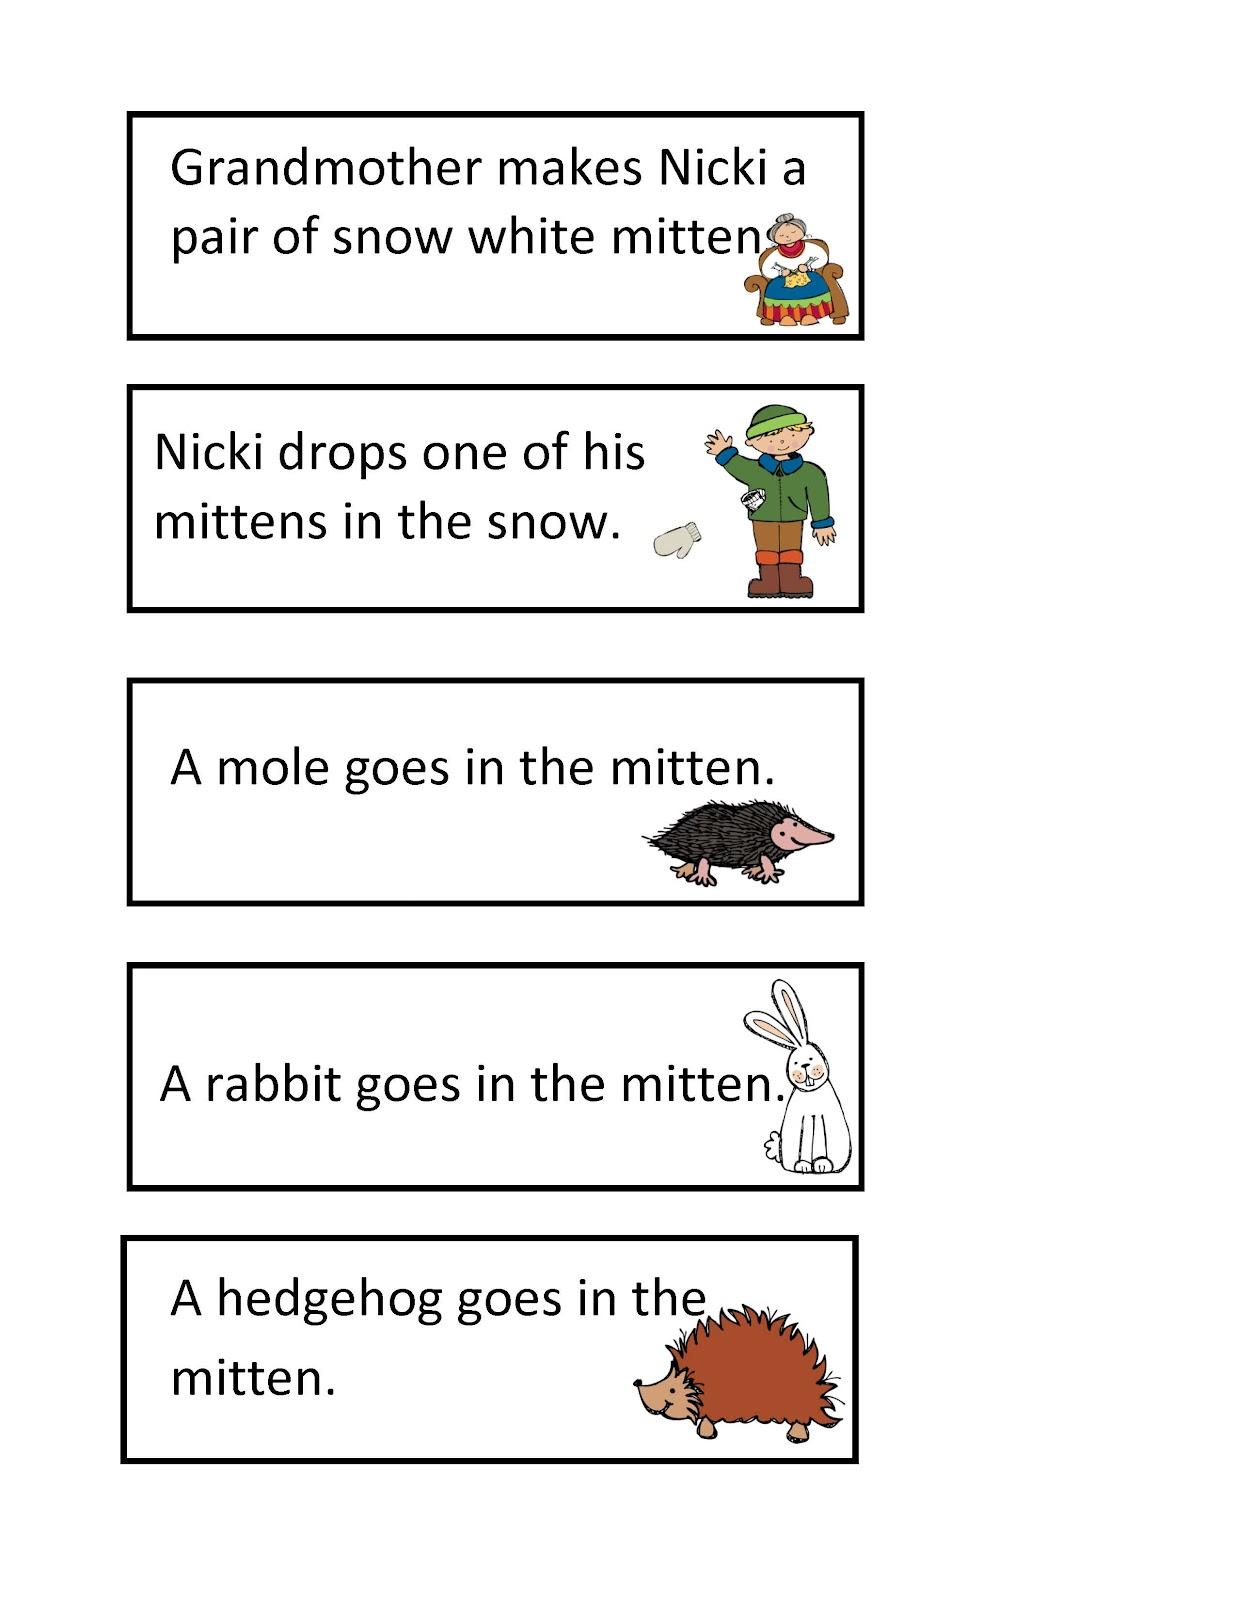 Mitten Pattern Printable The mitten printable